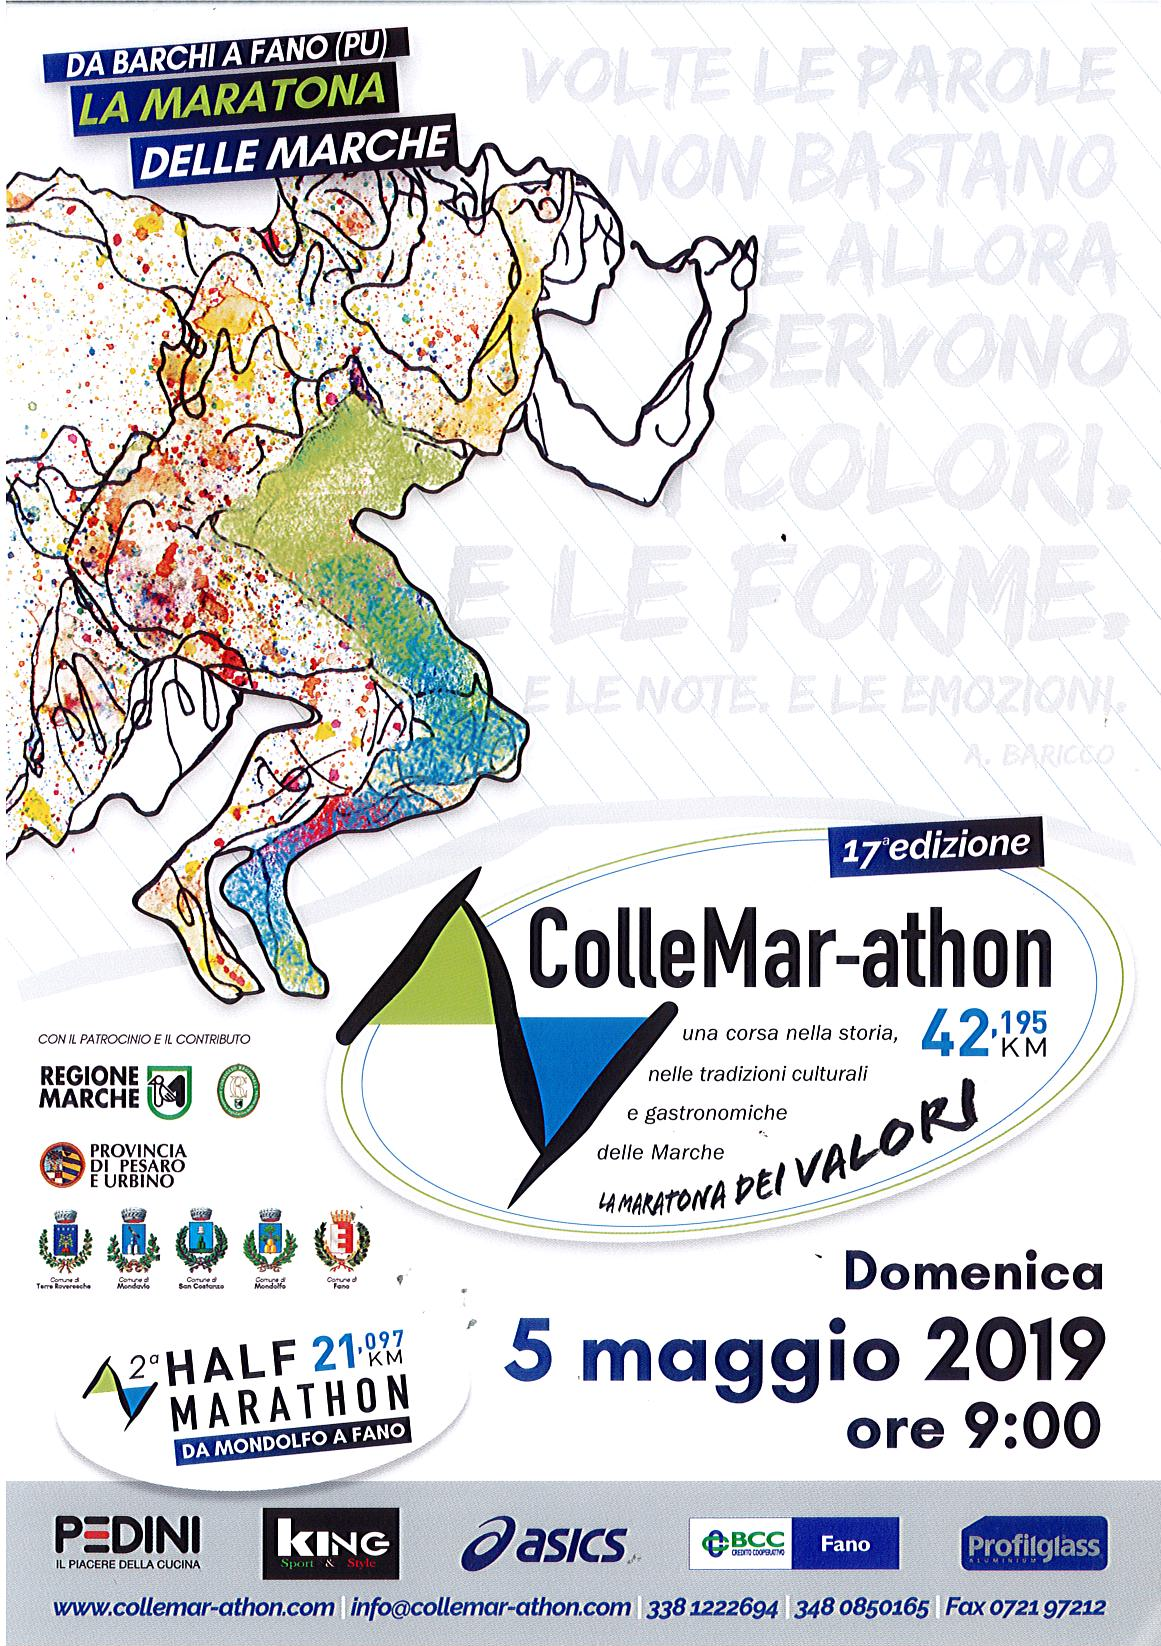 ColleMar-athon 2019